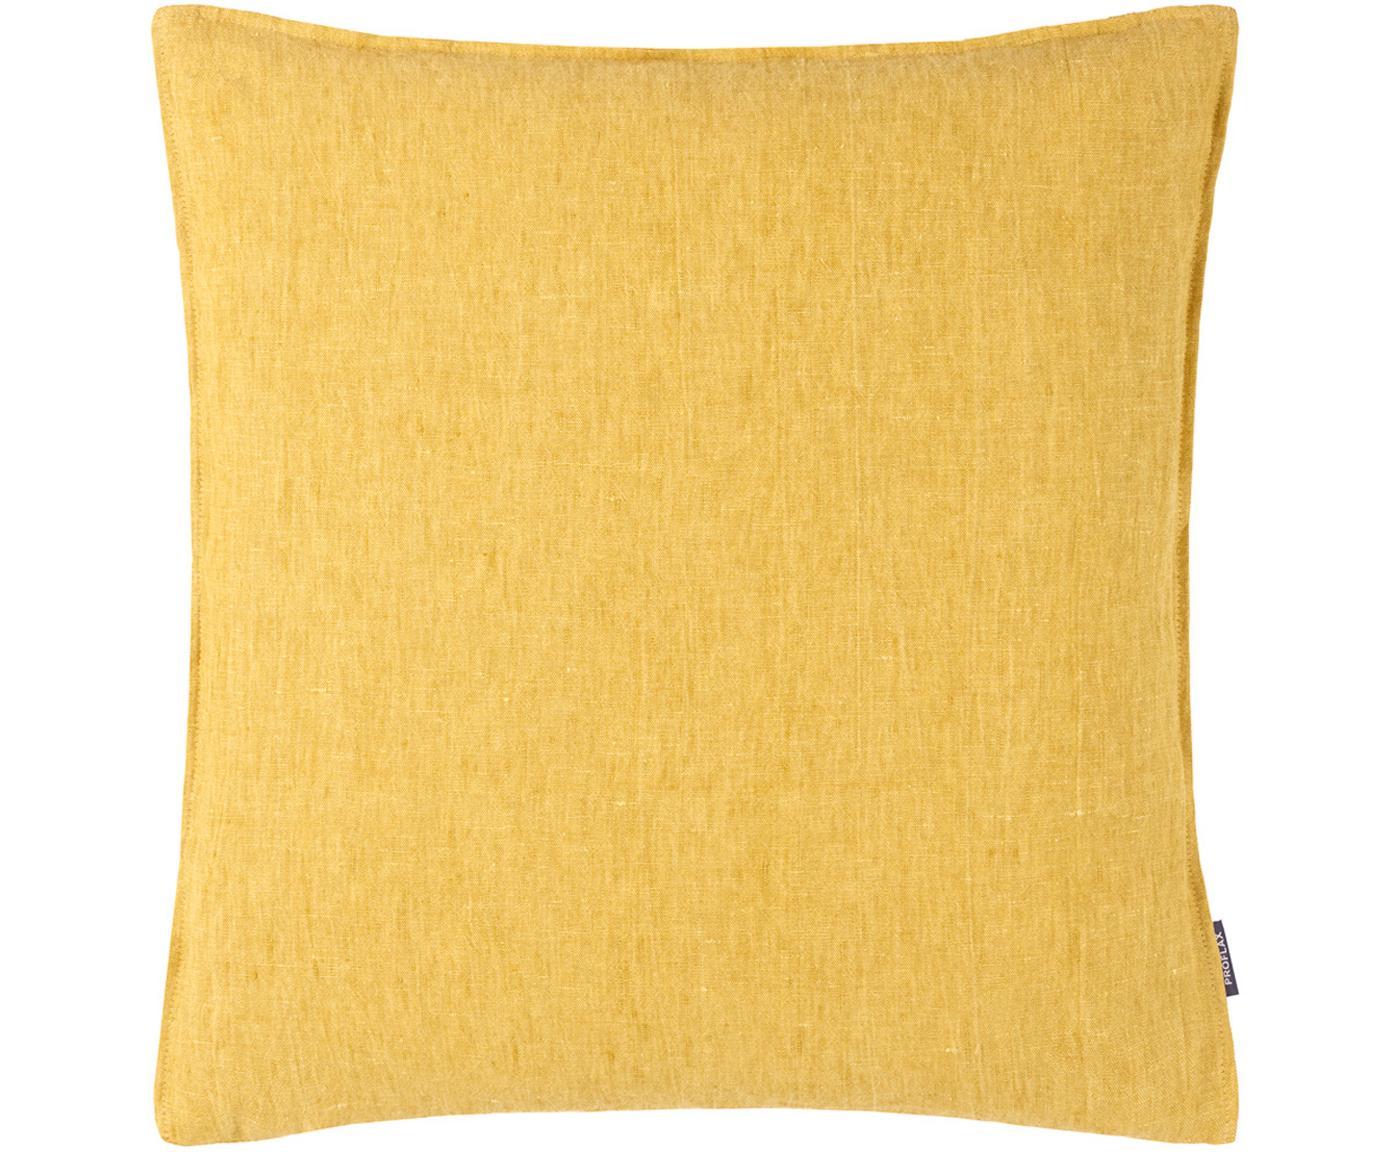 Poszewka na poduszkę z lnu Sven, Len, Brunatnożółty, S 50 x D 50 cm